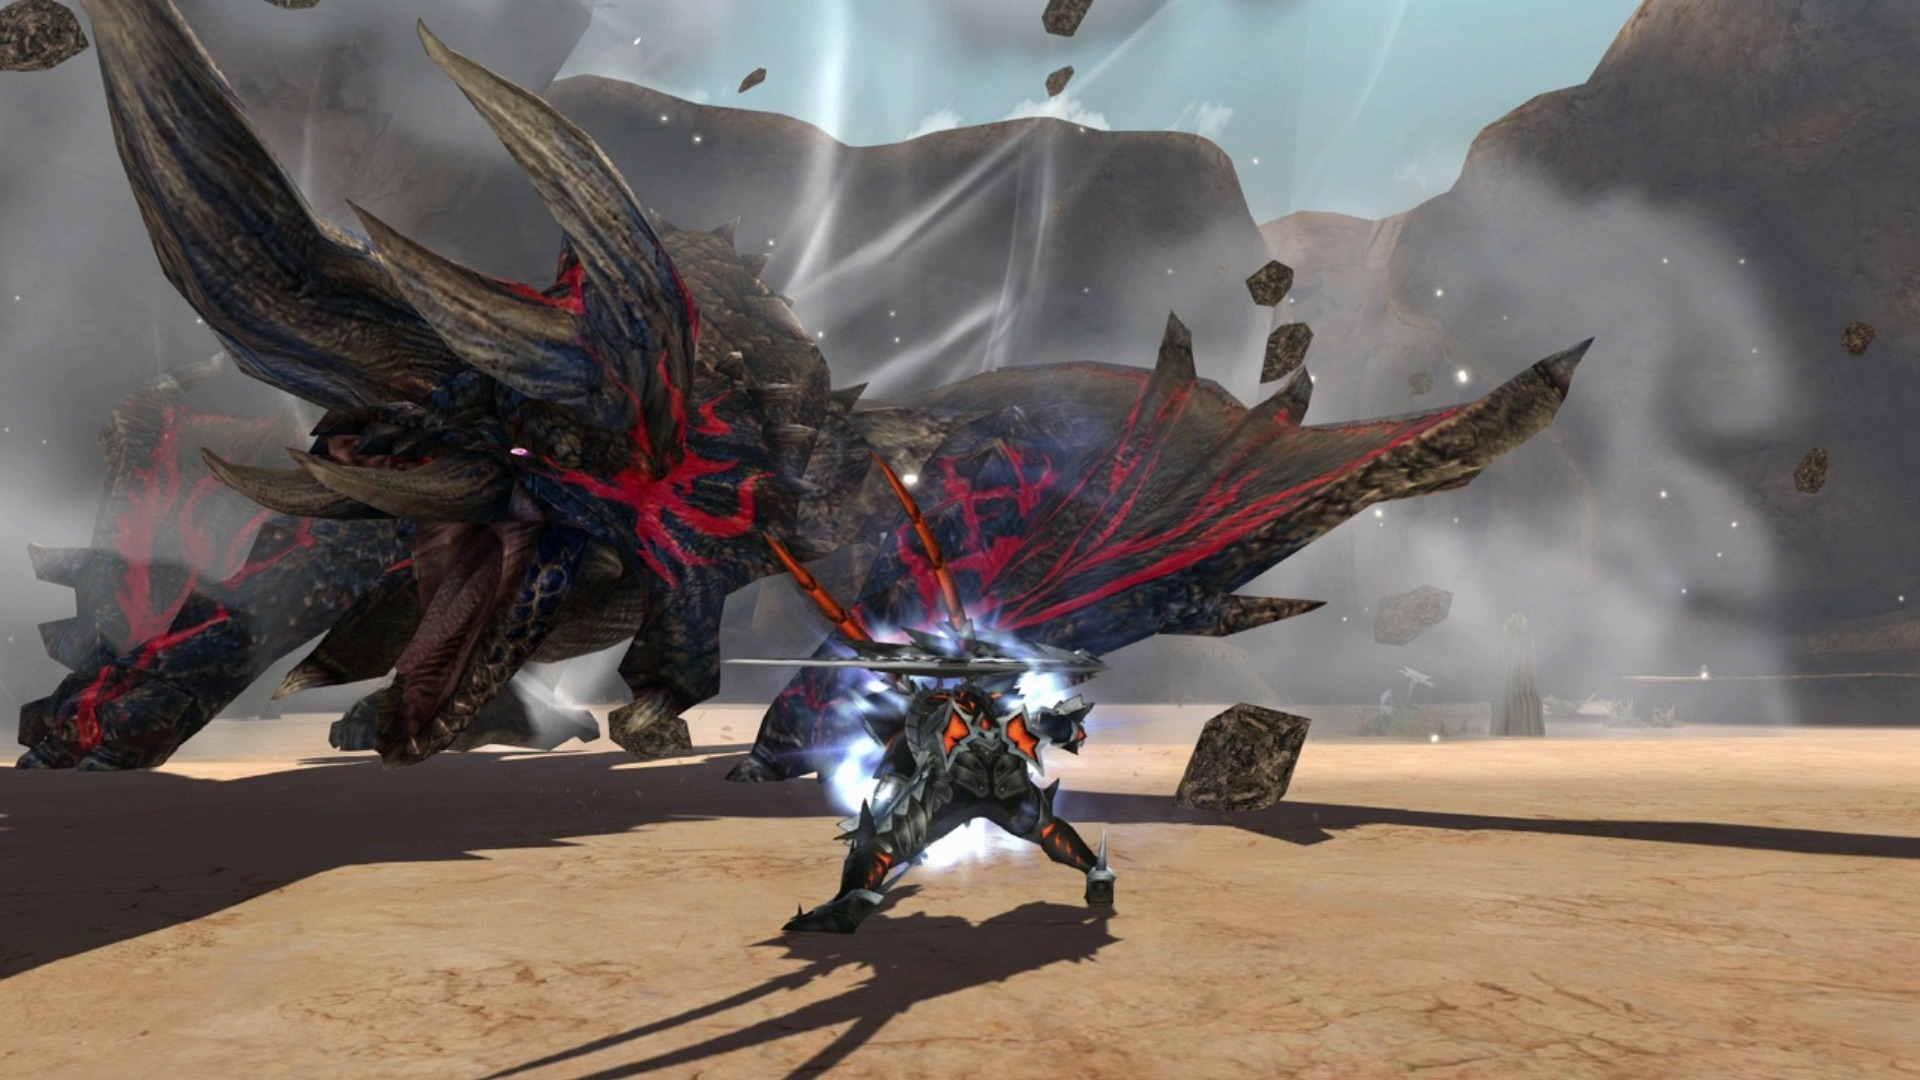 monster-hunter-xx-nintendo-switch-screenshot-4